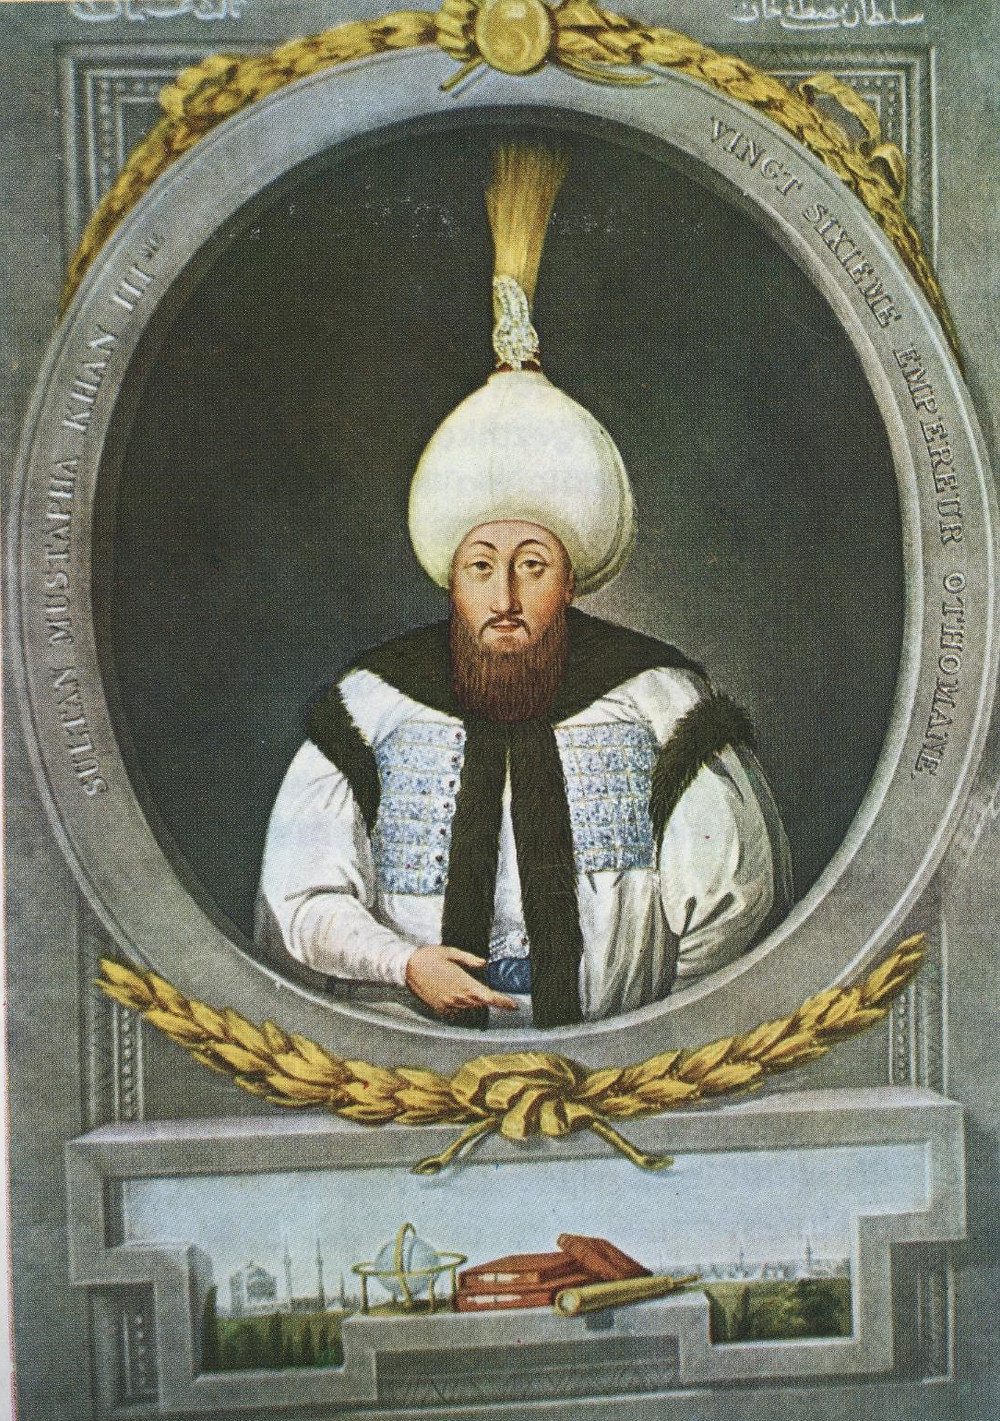 Sultan Mustafa III